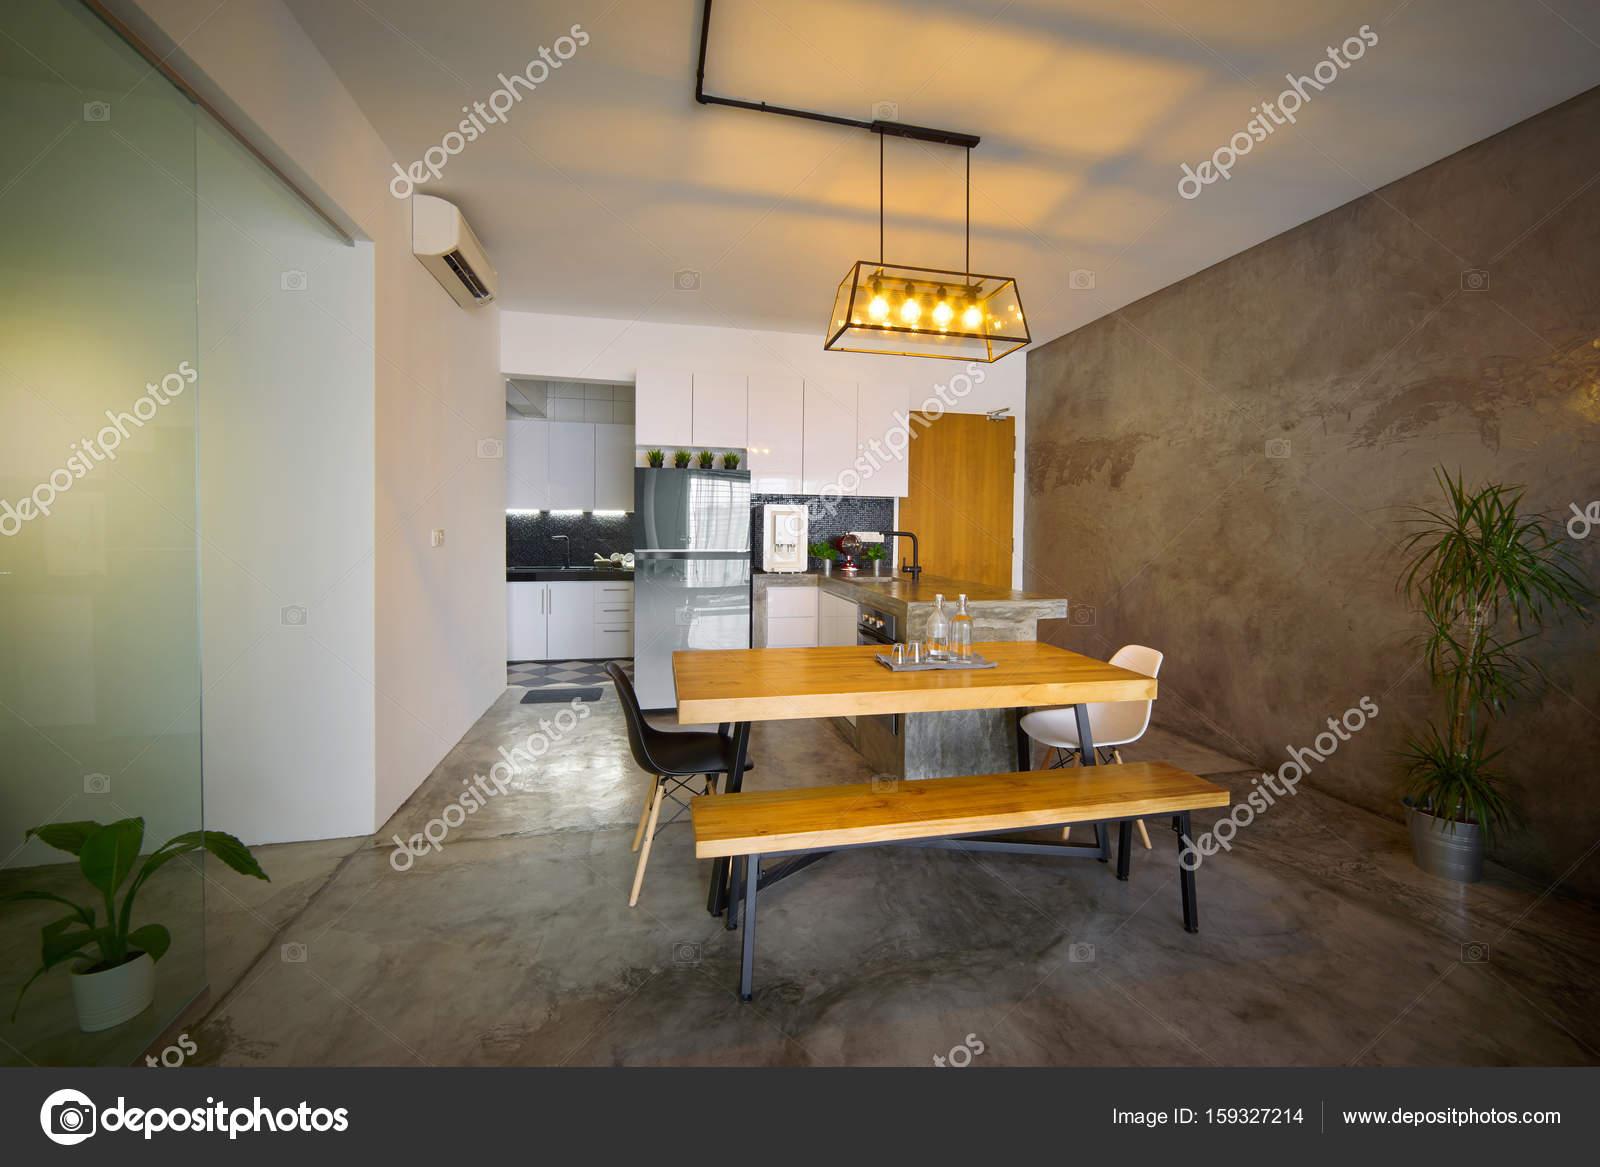 moderne Küche Interieur — Stockfoto © jamesteohart #159327214